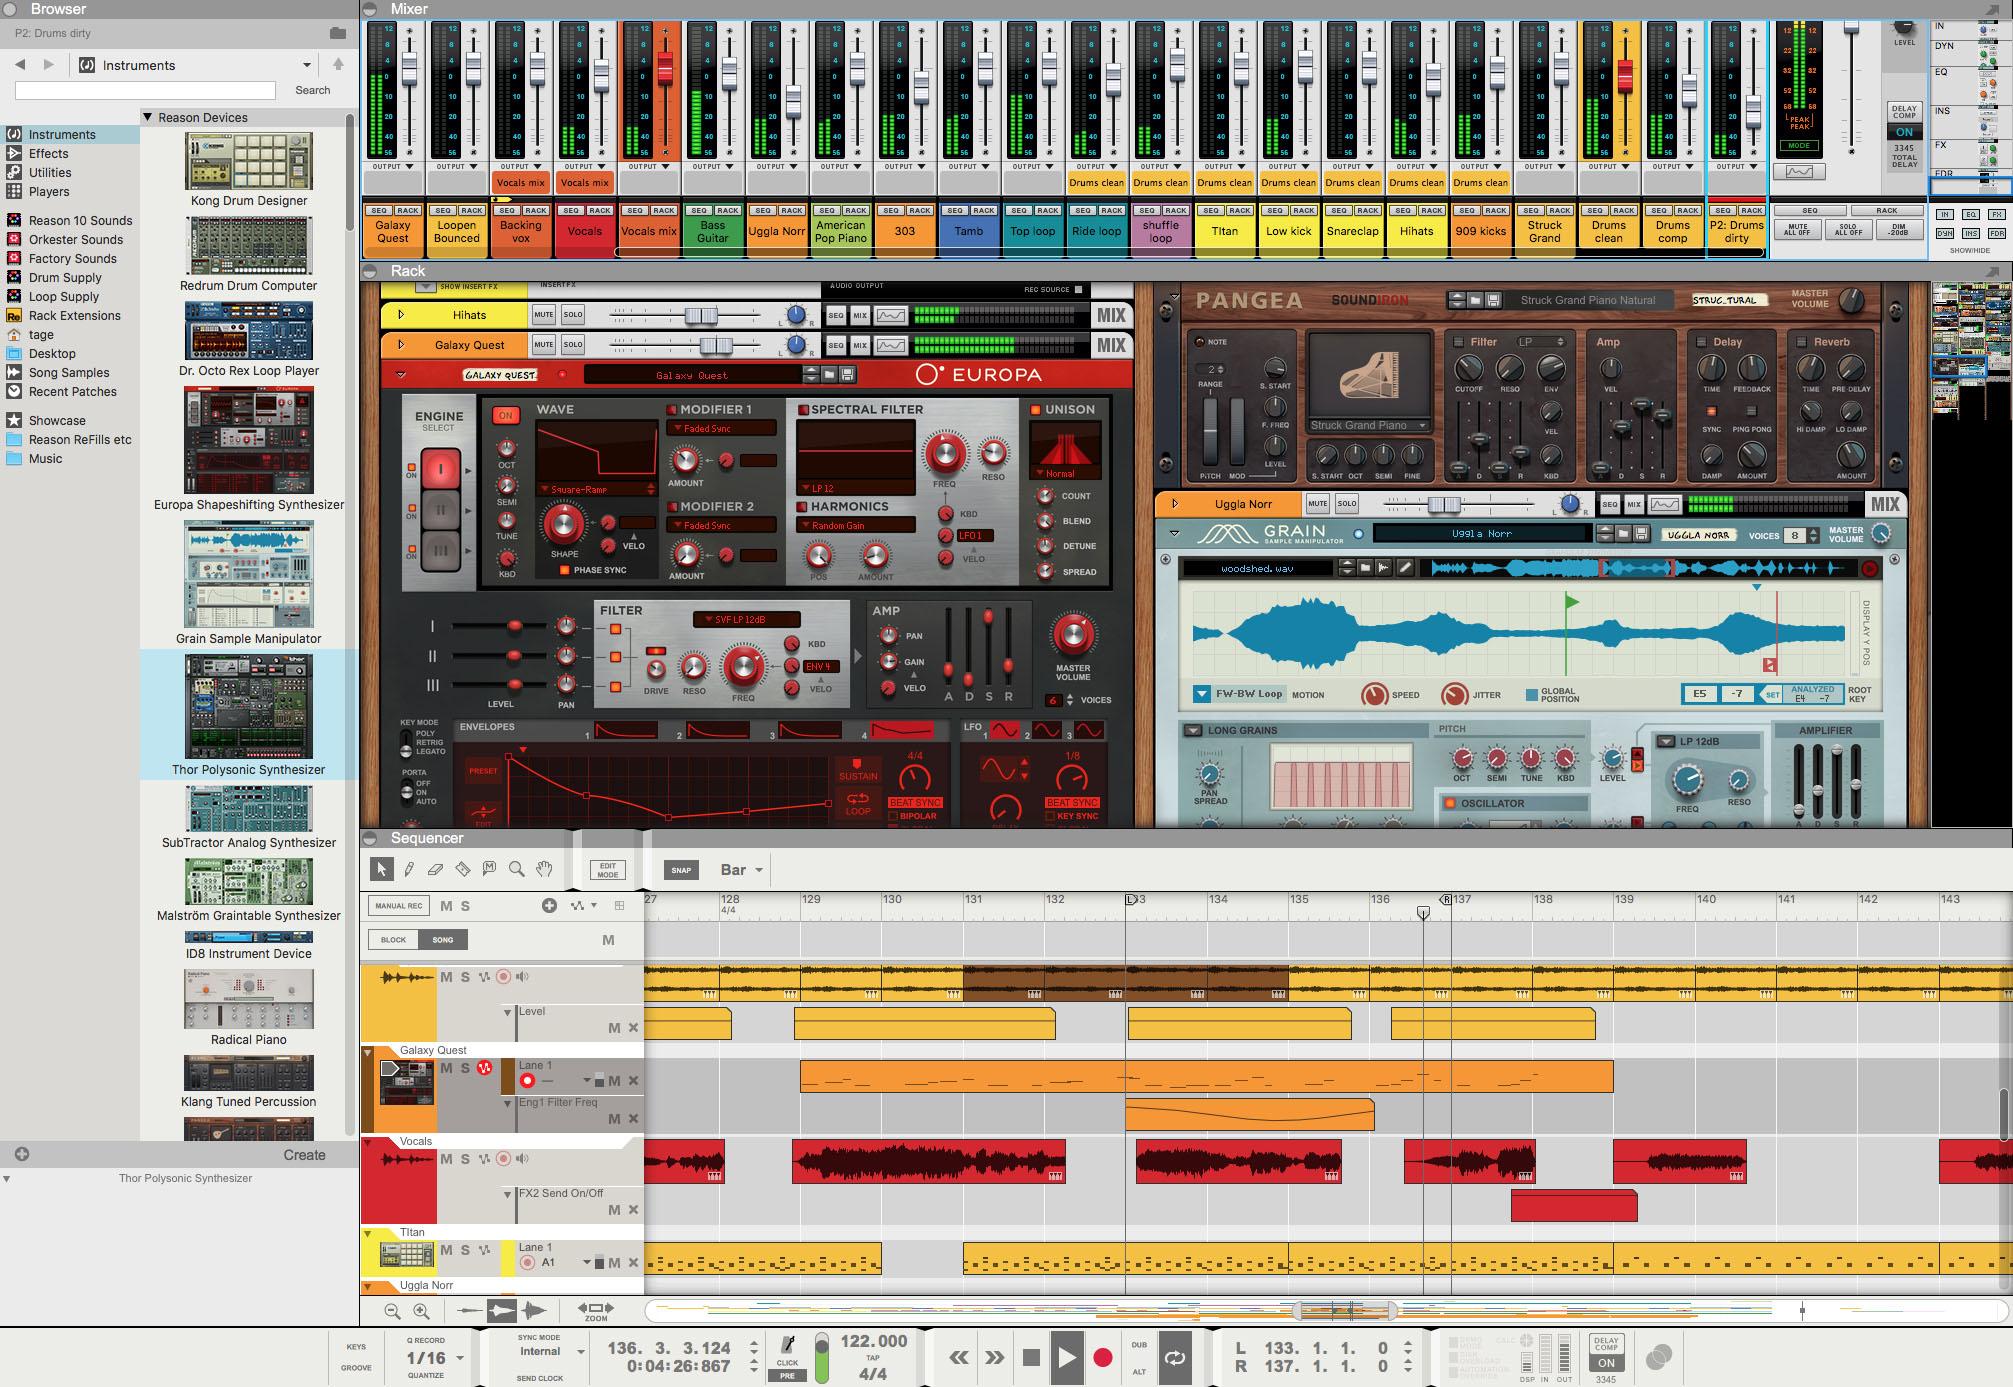 http://www.clynemedia.com/Propellerhead/Reason10_Released/R10-master-screenshot.jpg